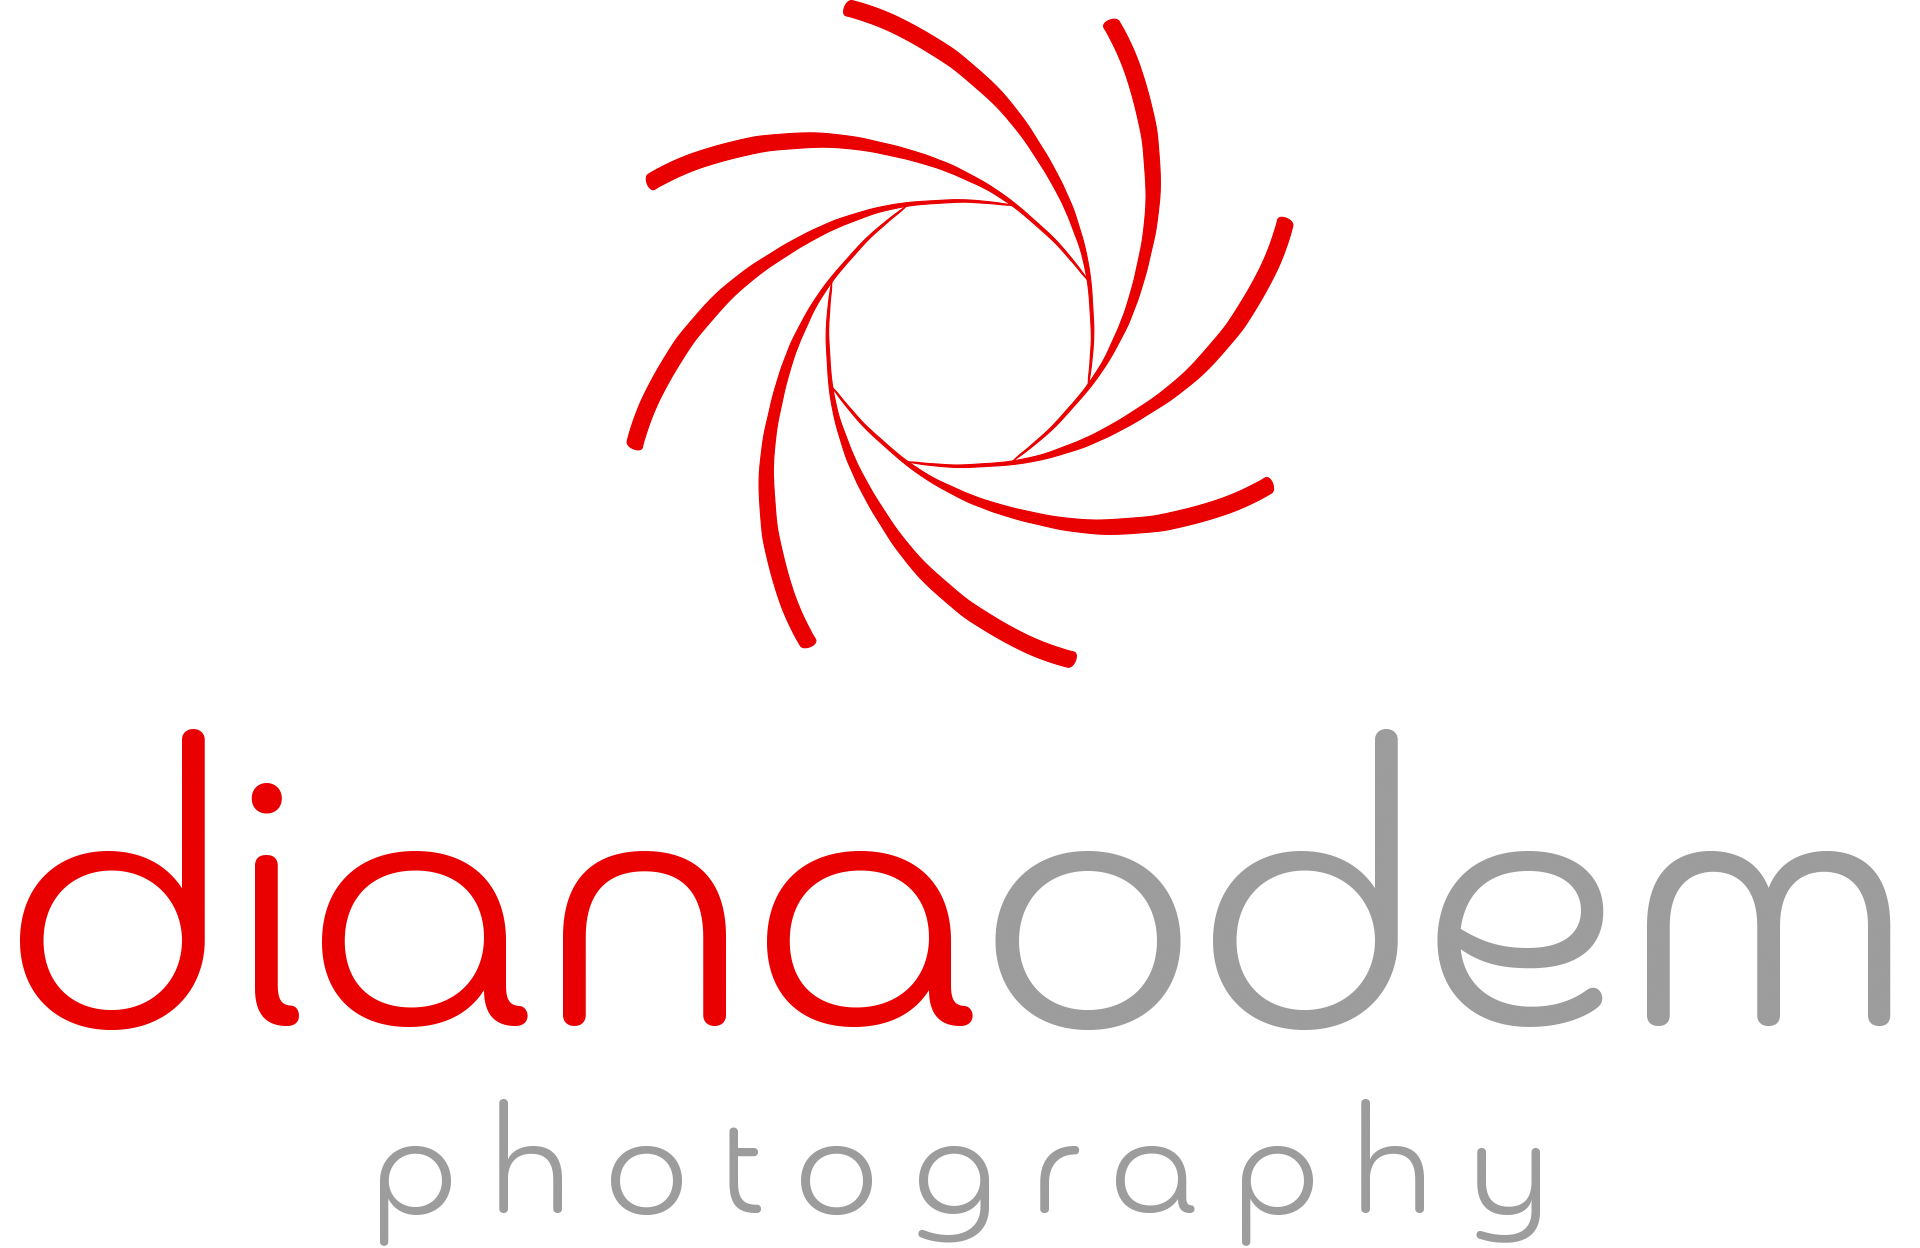 Diana Odem Photography